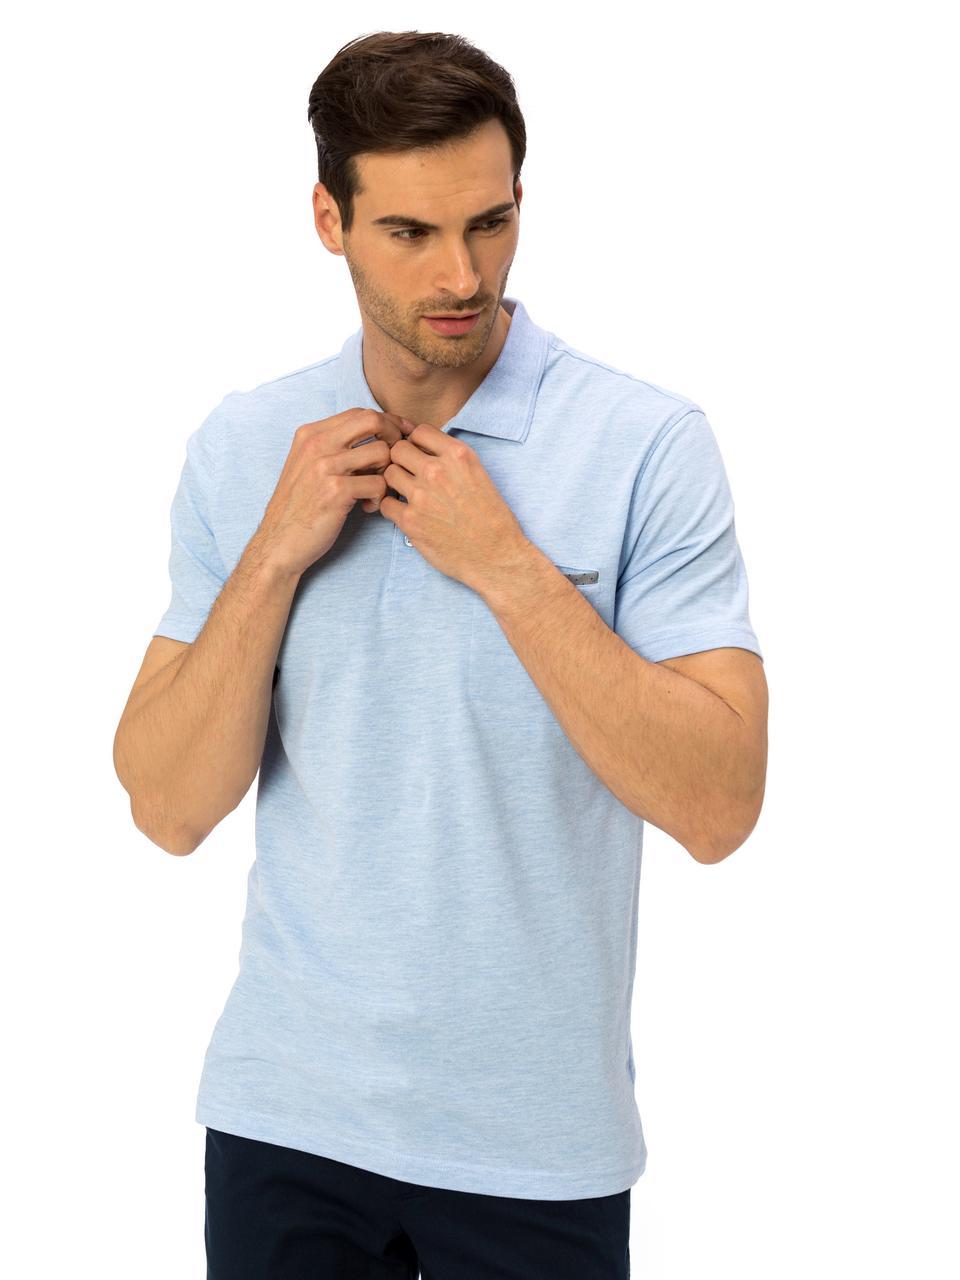 Голубое мужское поло LC Waikiki / ЛС Вайкики с карманом на груди